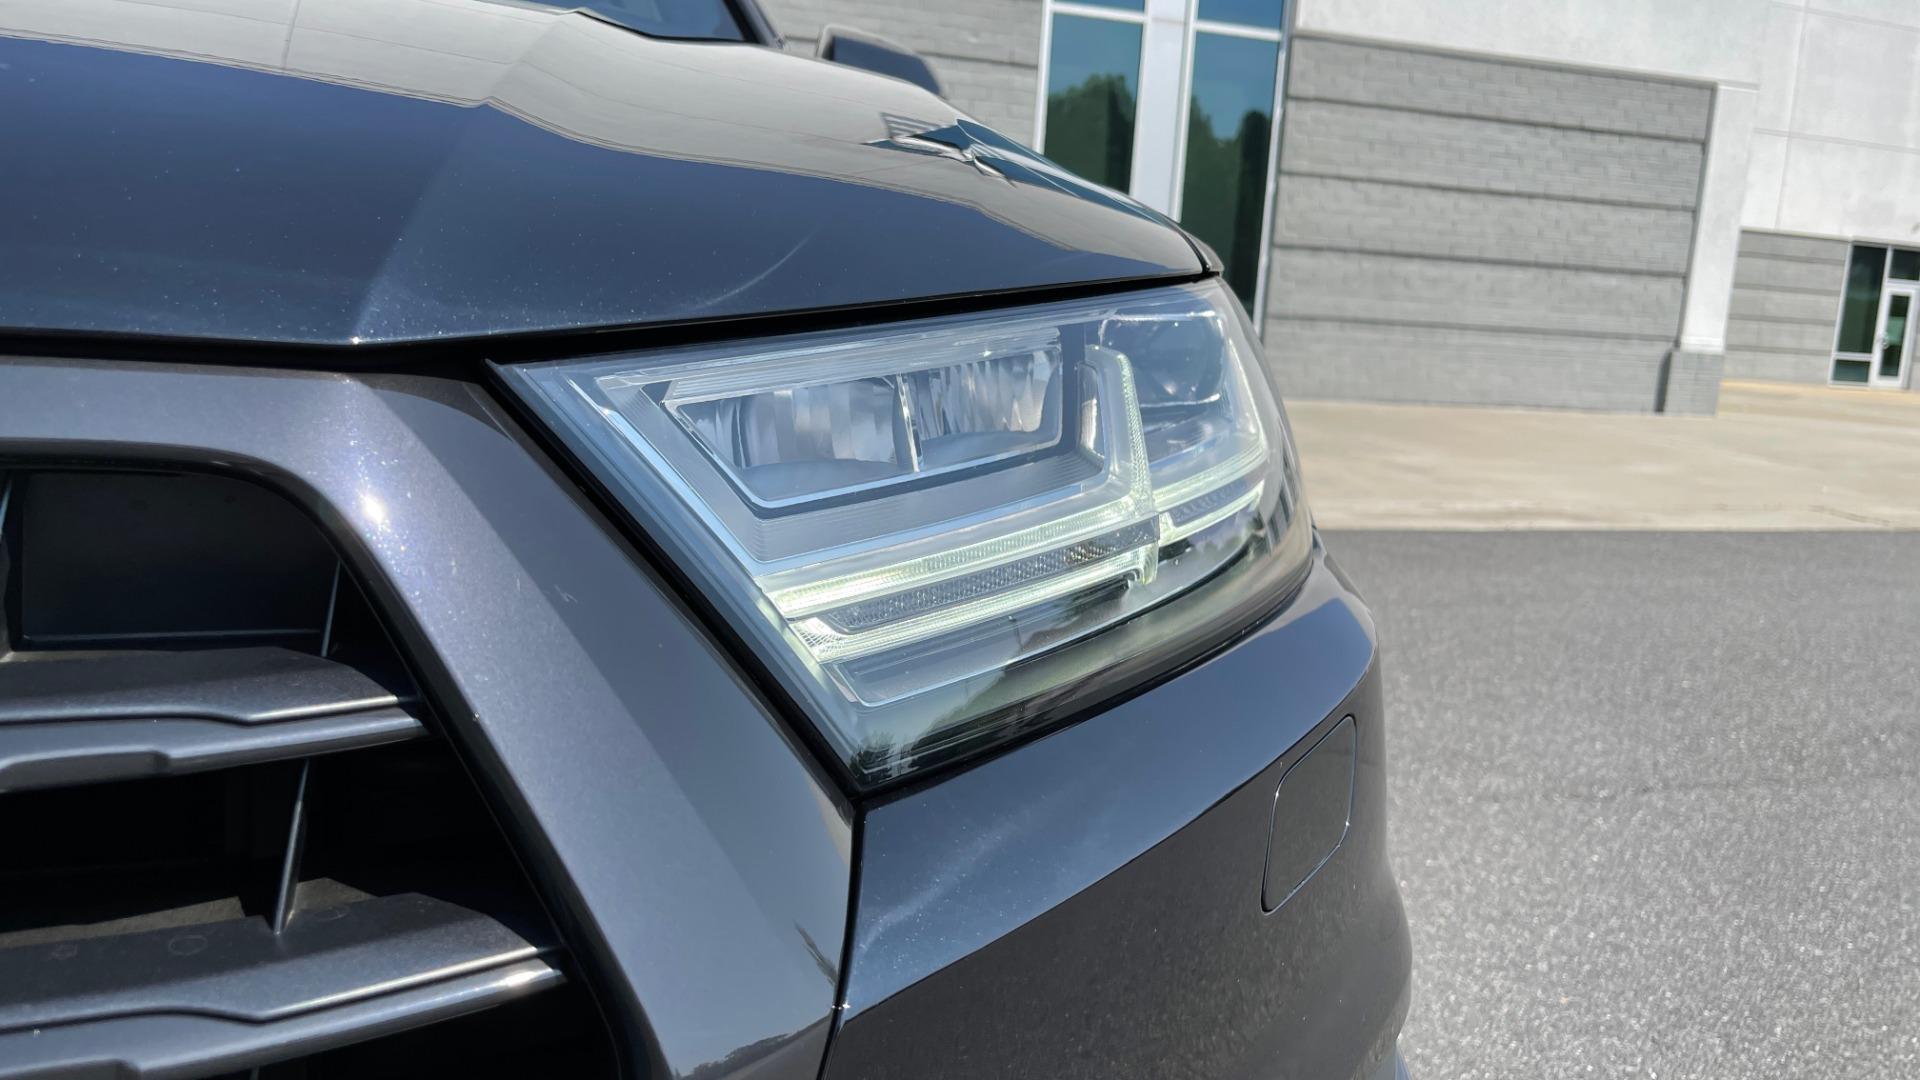 Used 2018 Audi Q7 PRESTIGE TIPTRONIC / NAV / SUNROOF / ADAPTIVE PKG / DRVR ASST / CLD WTHR /  for sale $49,995 at Formula Imports in Charlotte NC 28227 11